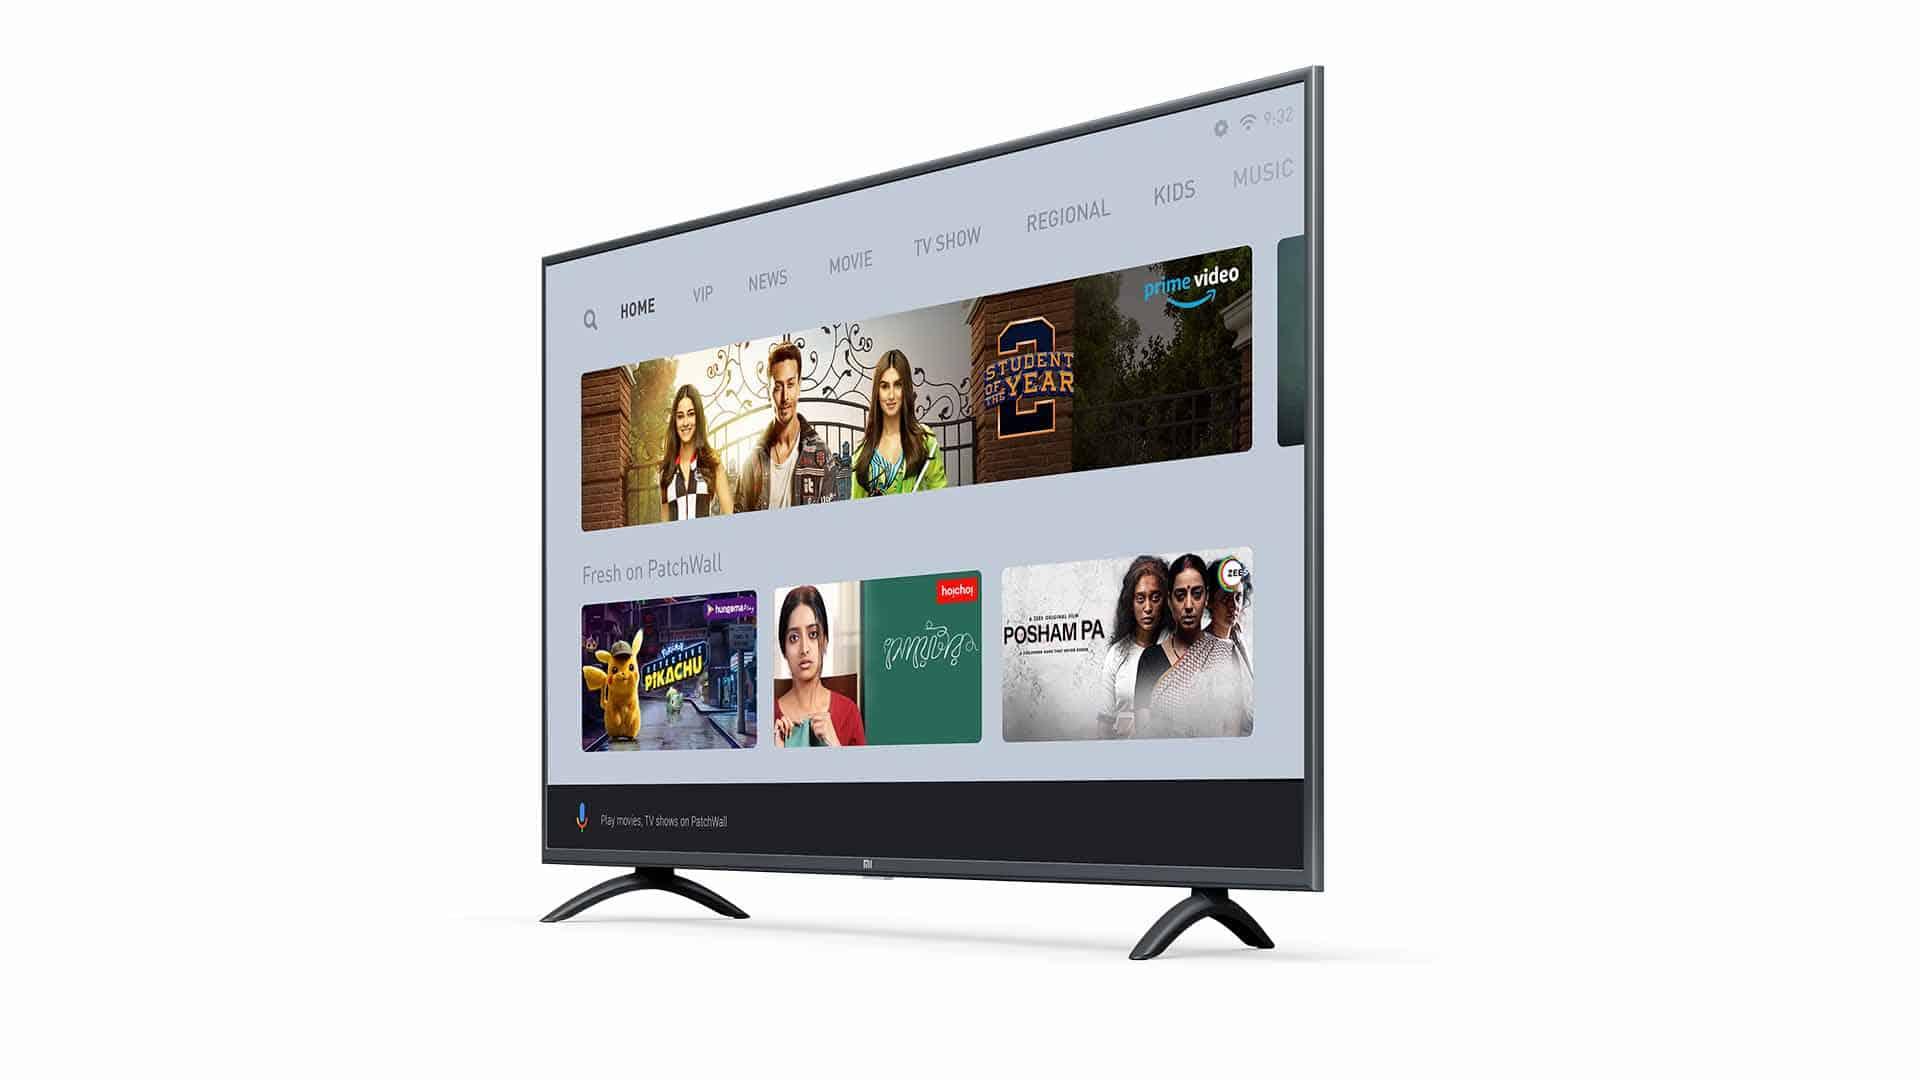 mi tv 4x 55 inch review netflix